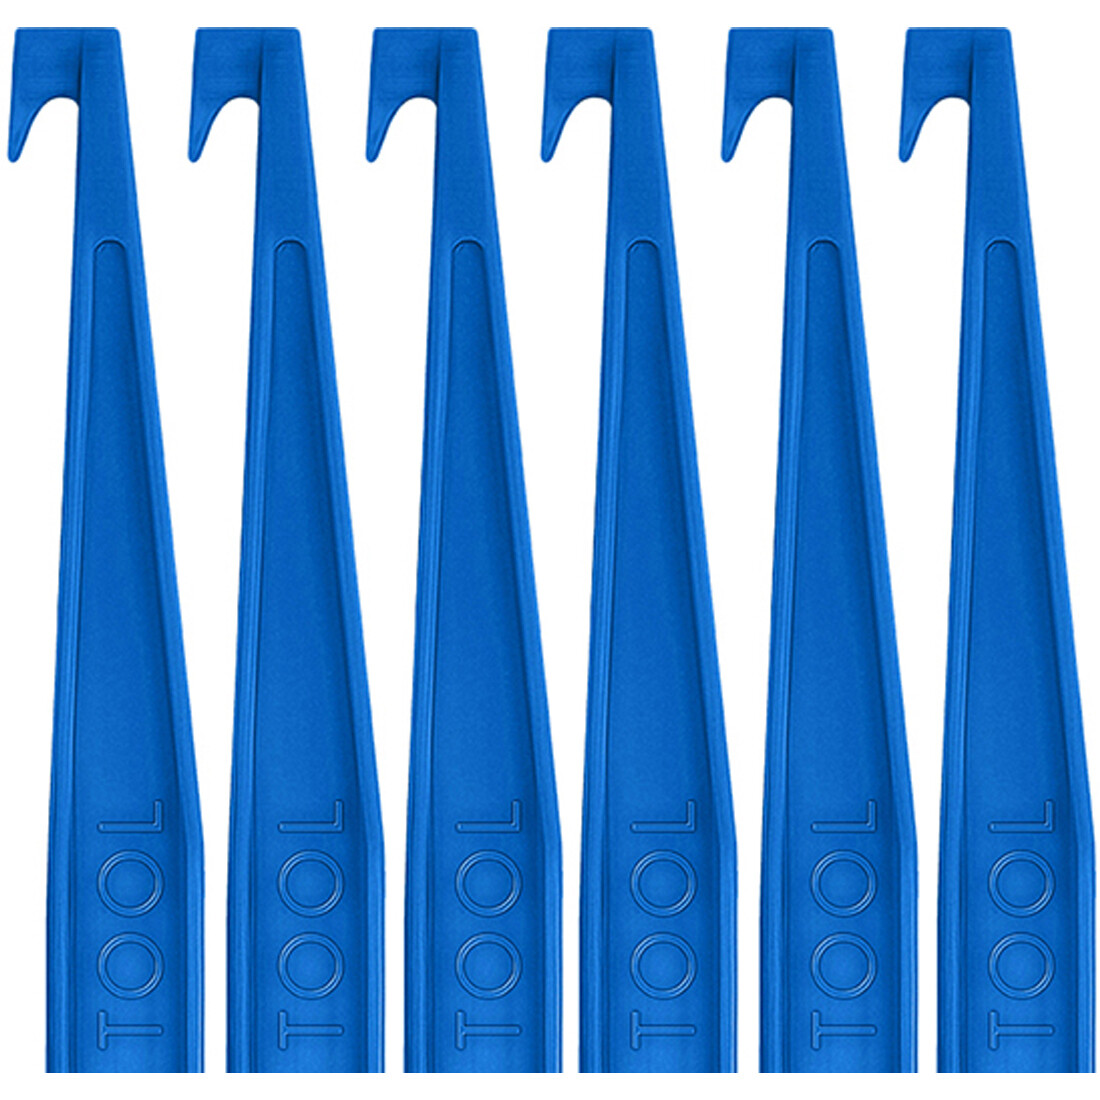 60 BULK UNPACKAGED OUTIE TOOLS - 60 SKY BLUE